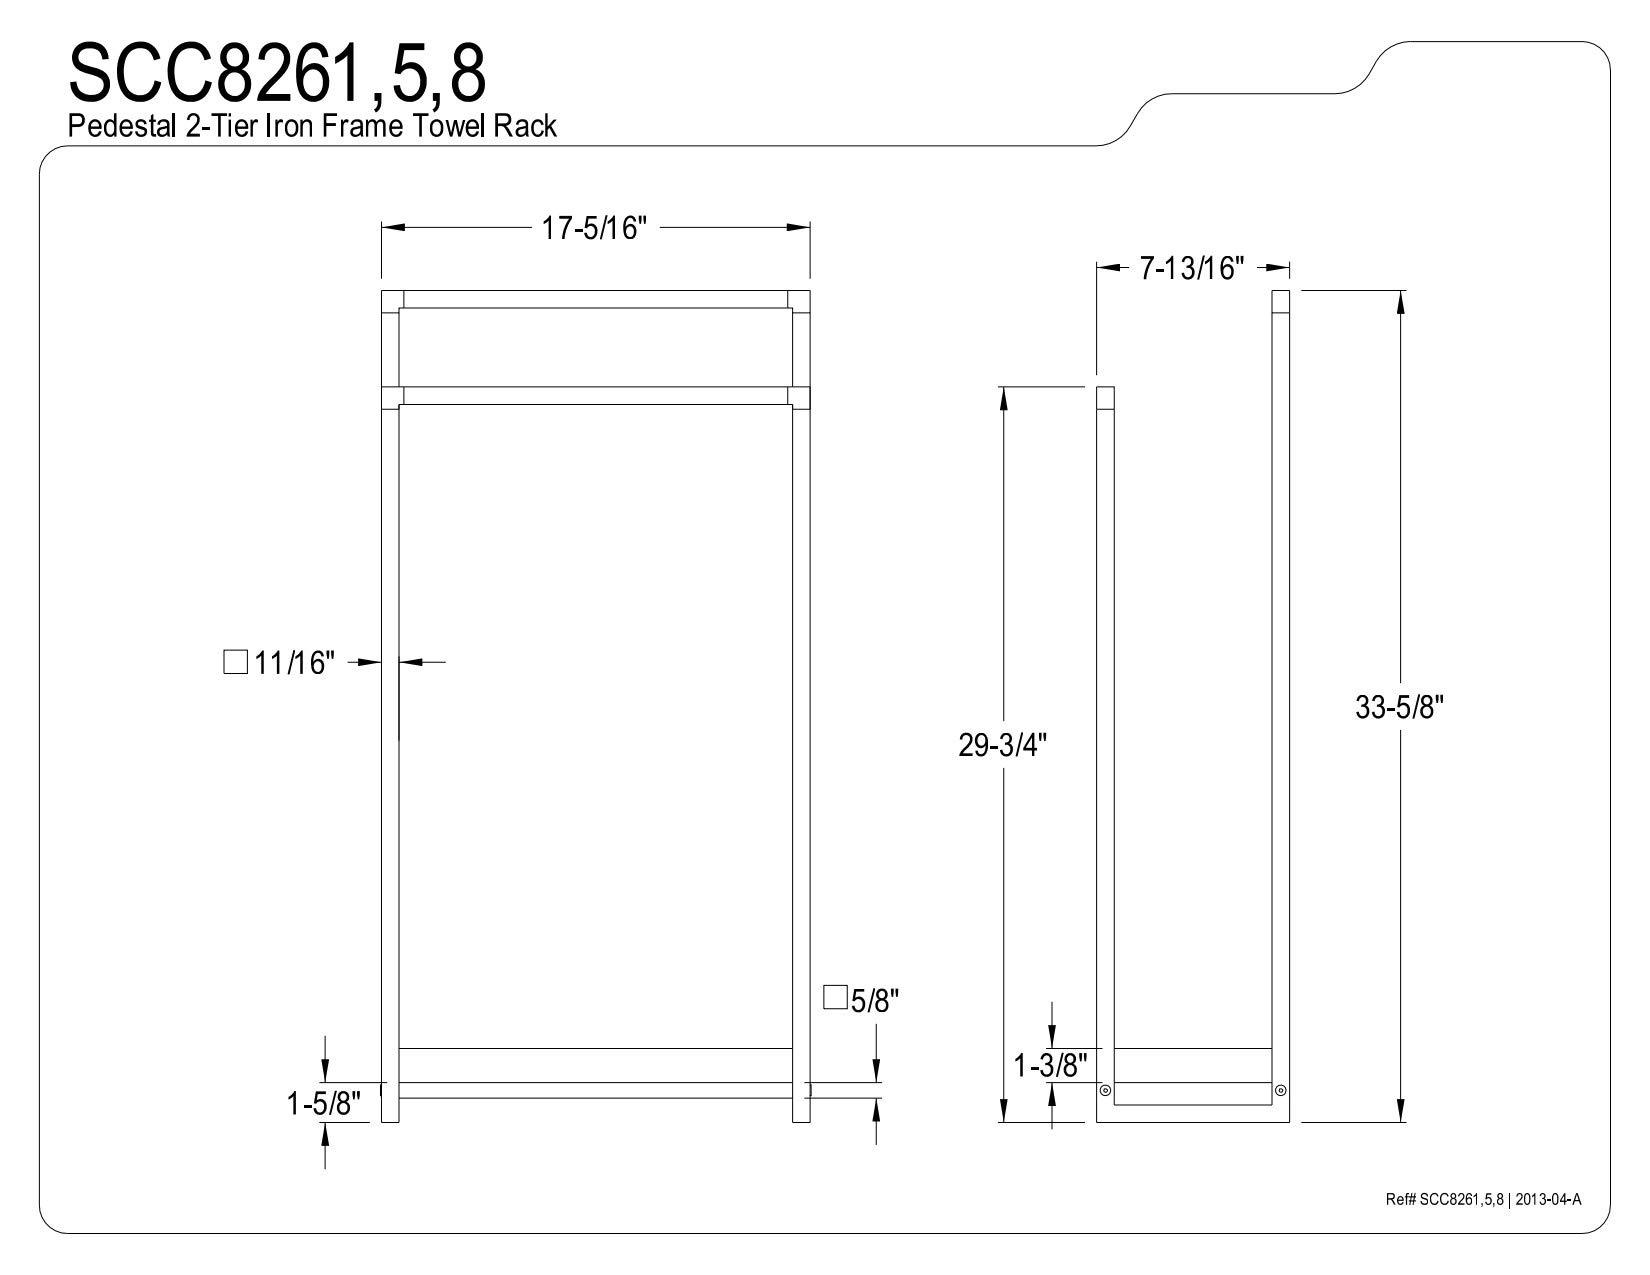 Kingston Brass SCC8268 Pedestal 2-Tier Steel Construction Towel Rack with Wooden Case, Brushed Nickel